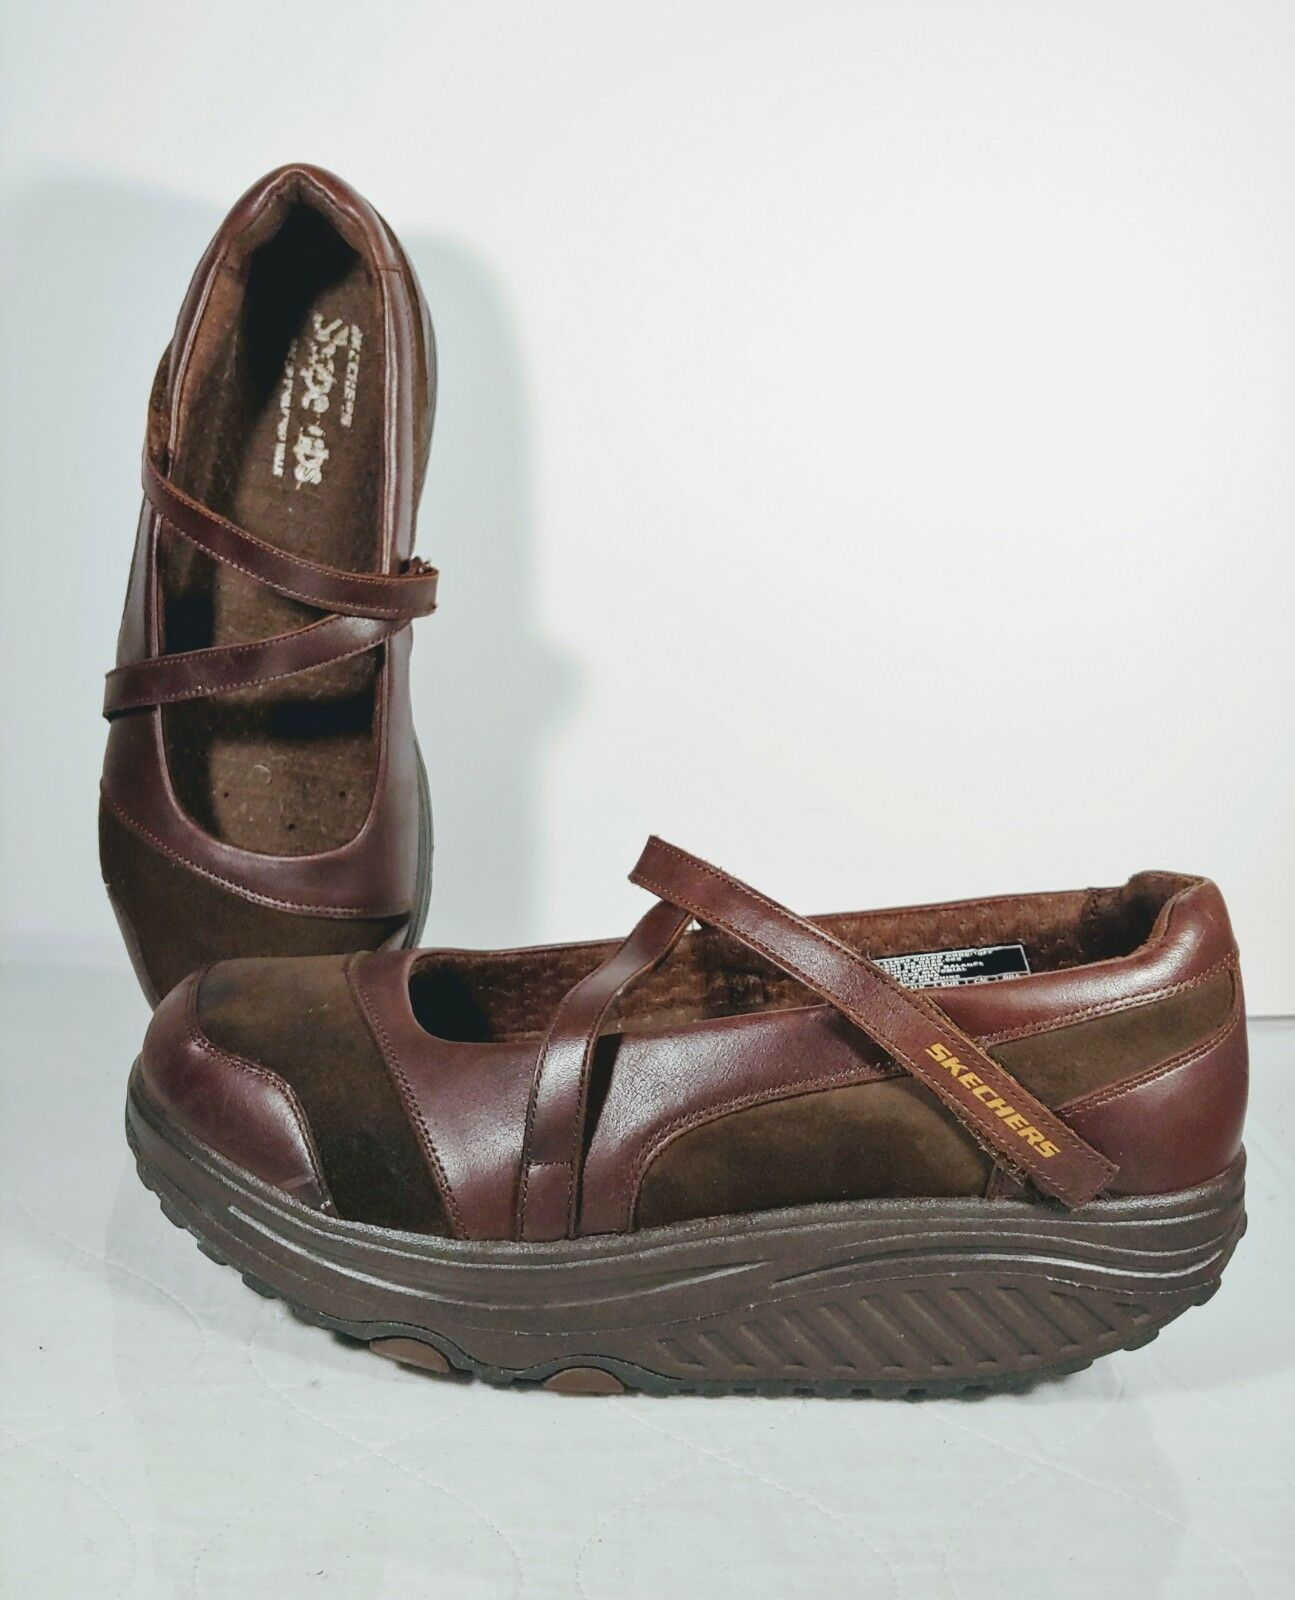 Skechers Shape Ups Mary Jane Women's Brown Leather Toning Walking shoes Sz 10